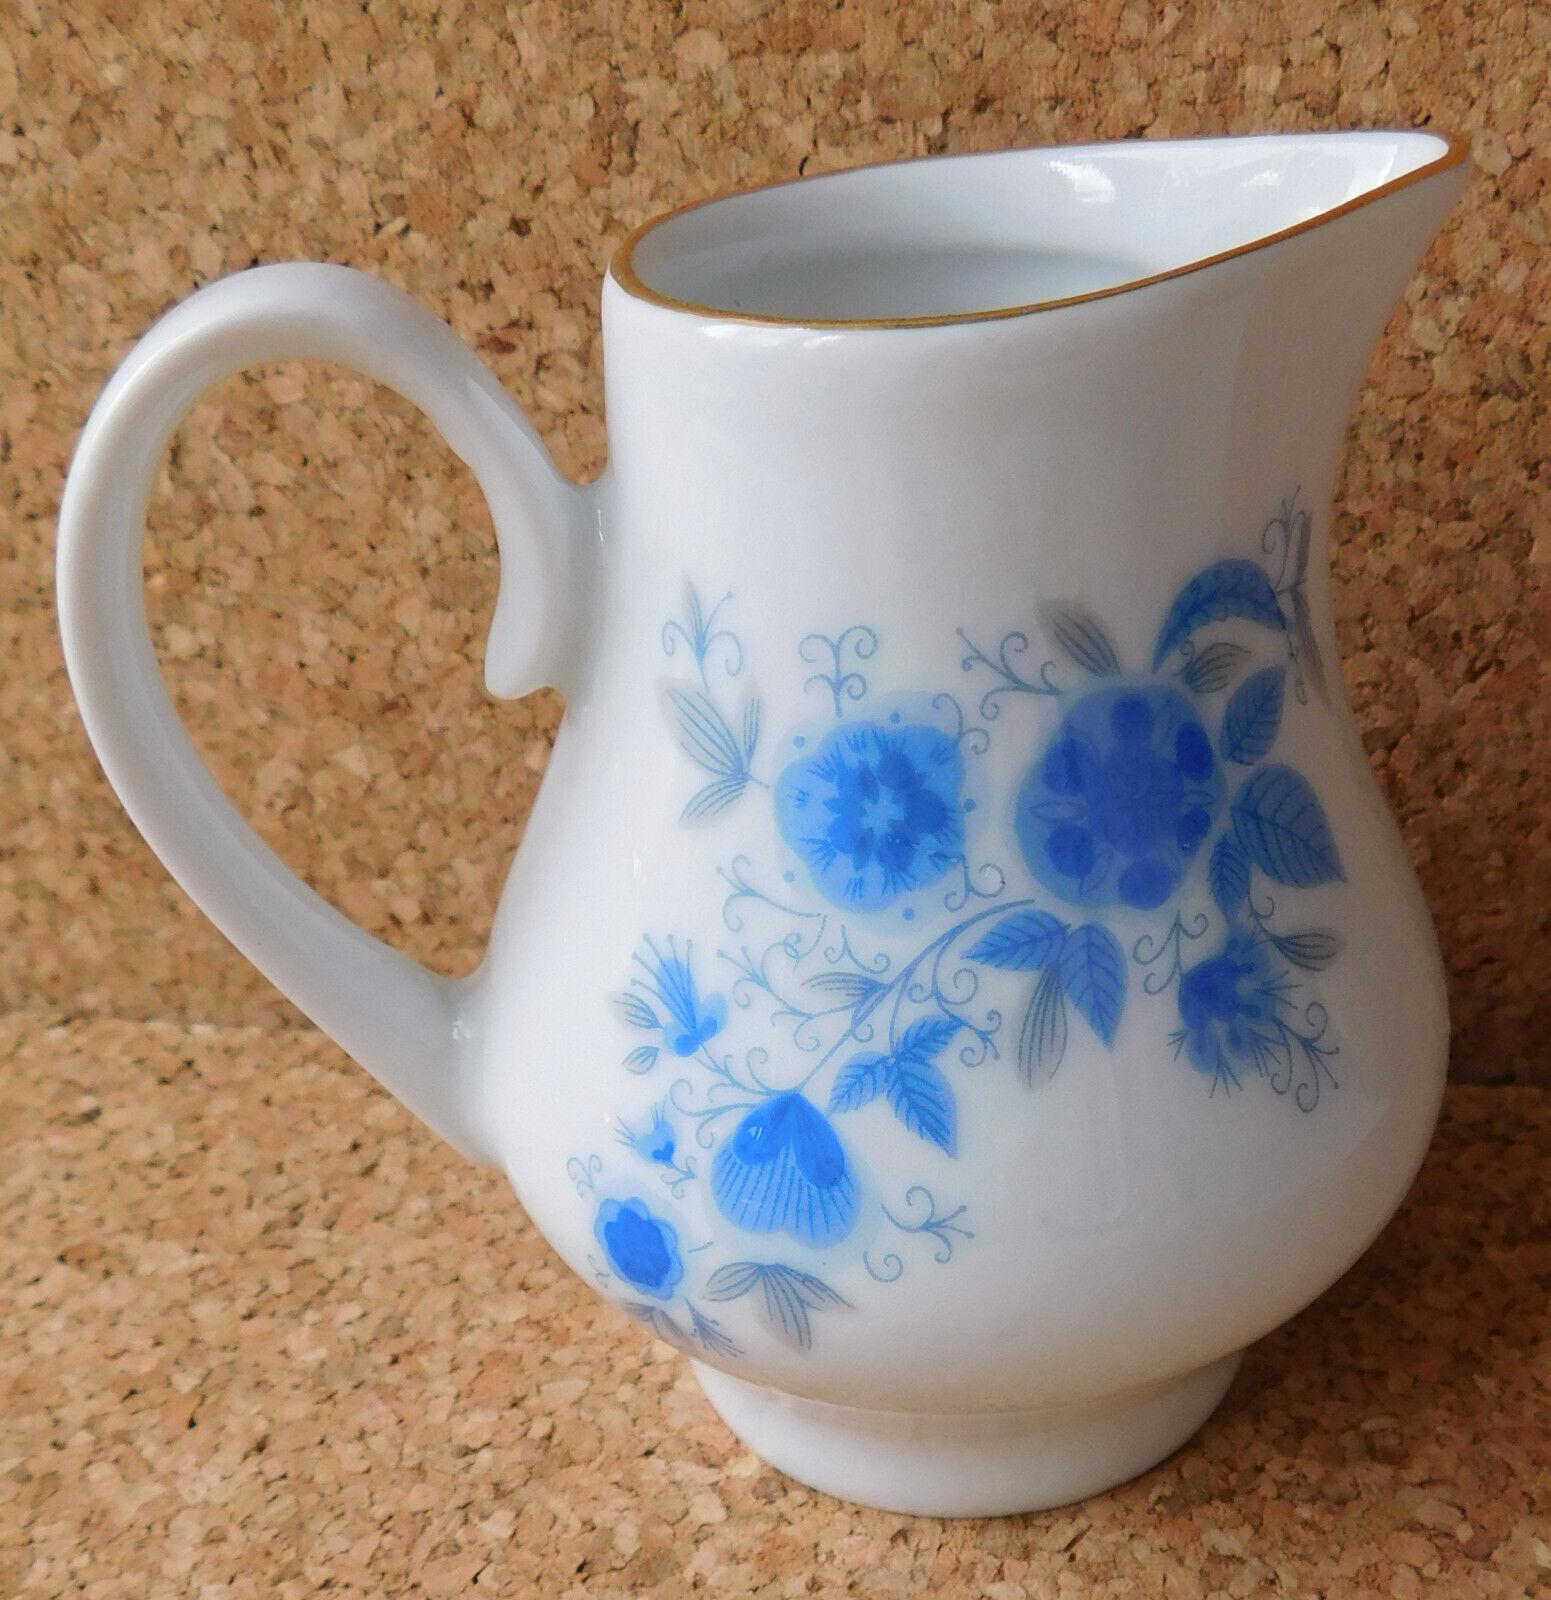 Kahla small jug for milk or cream German porcelain blue and white creamer